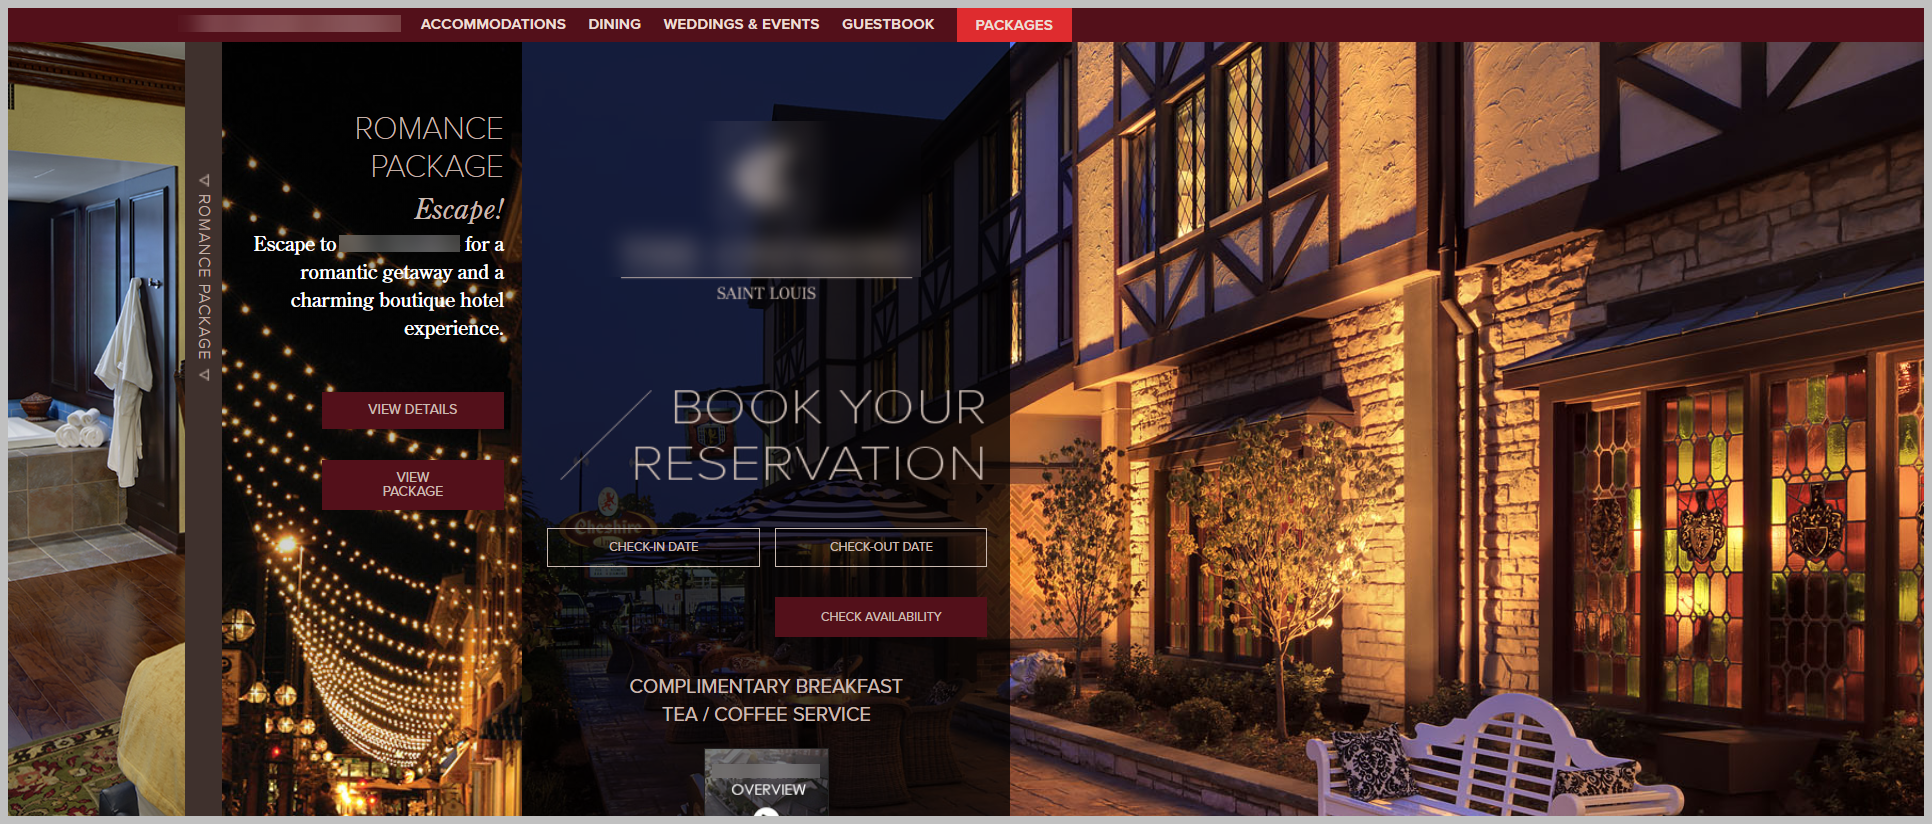 stlouis hotel screenshot